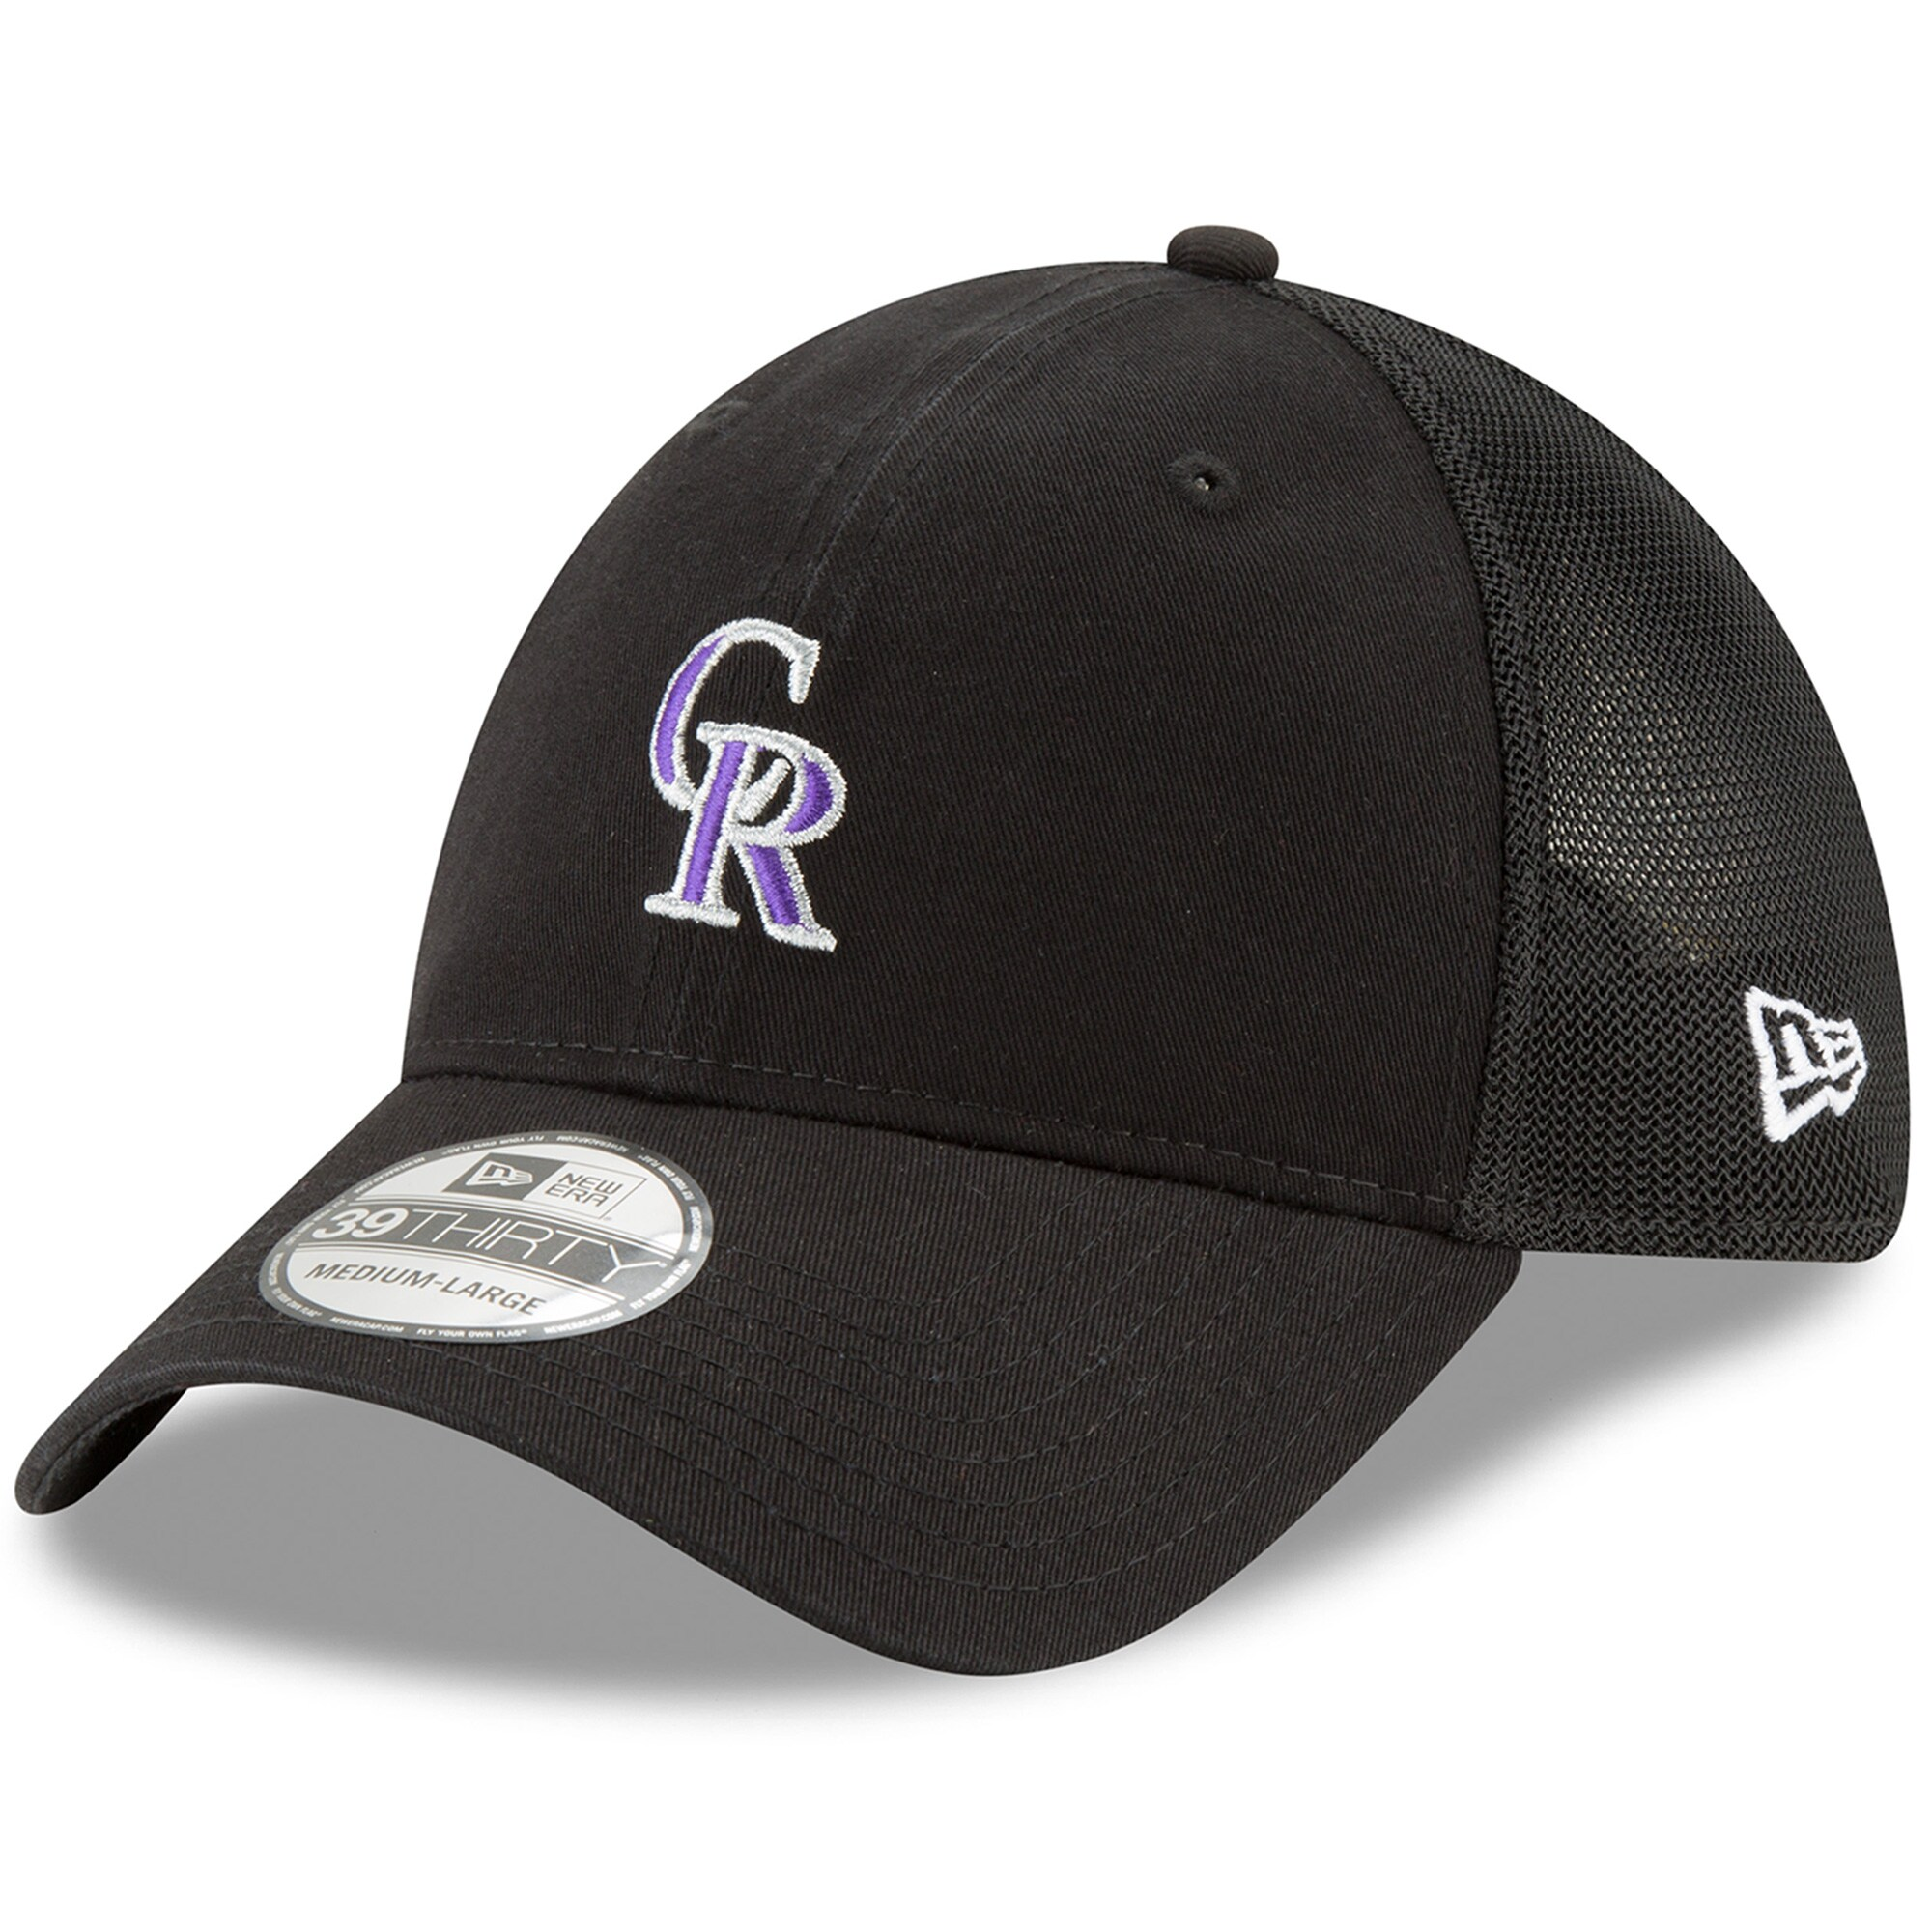 Colorado Rockies New Era Team Precision 39THIRTY Flex Hat - Black